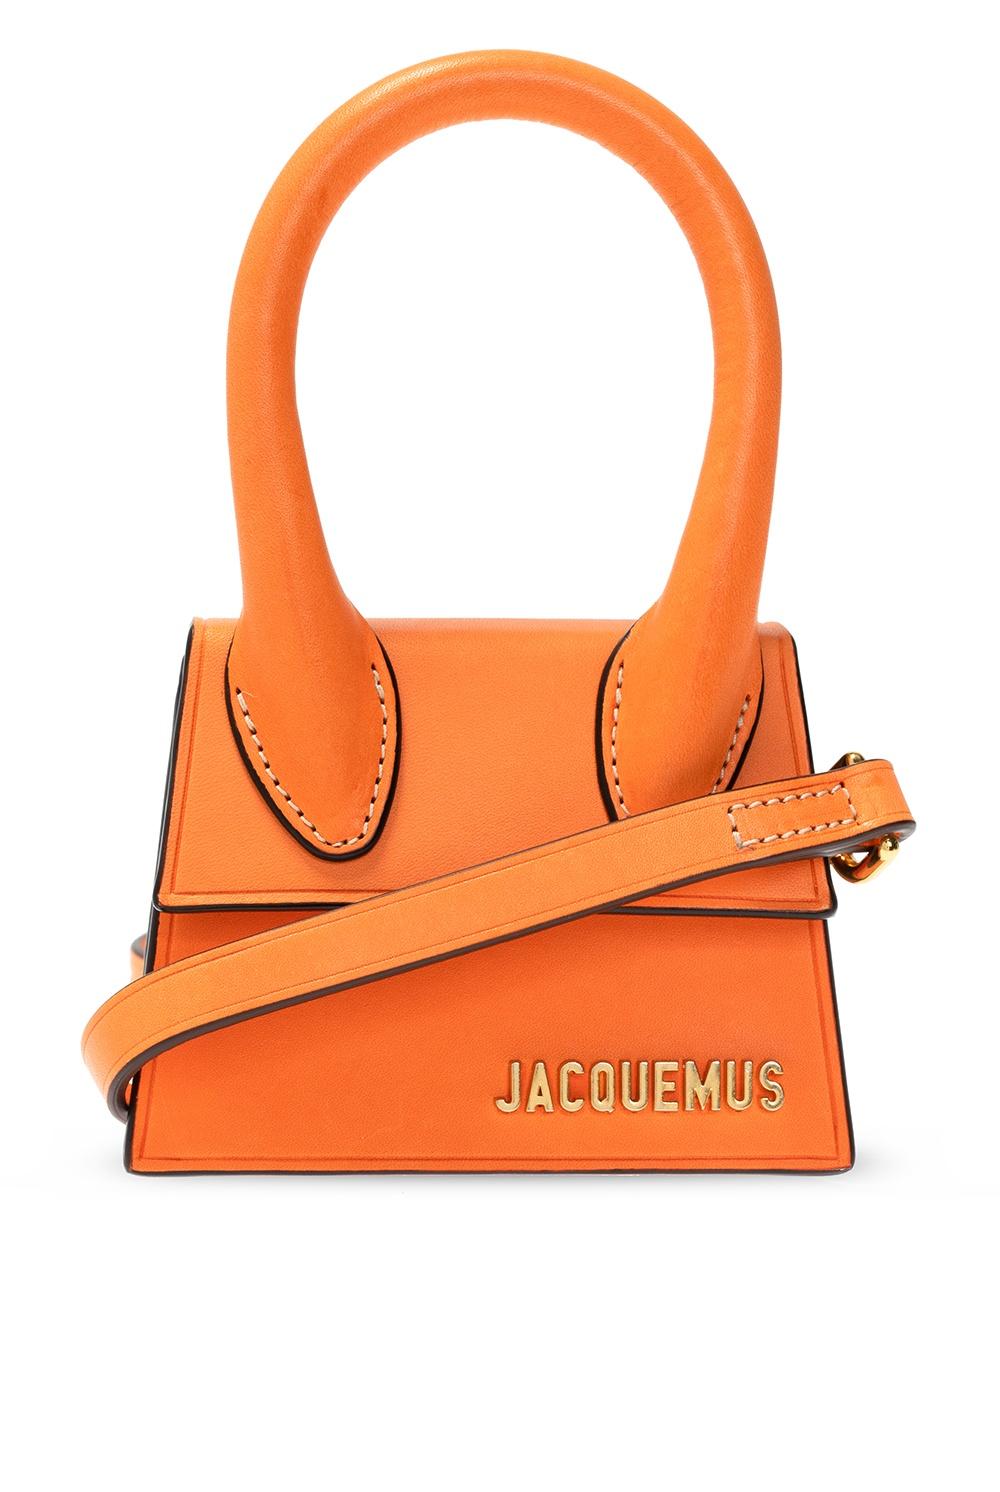 Jacquemus Torba na ramię 'Le Chiquito'